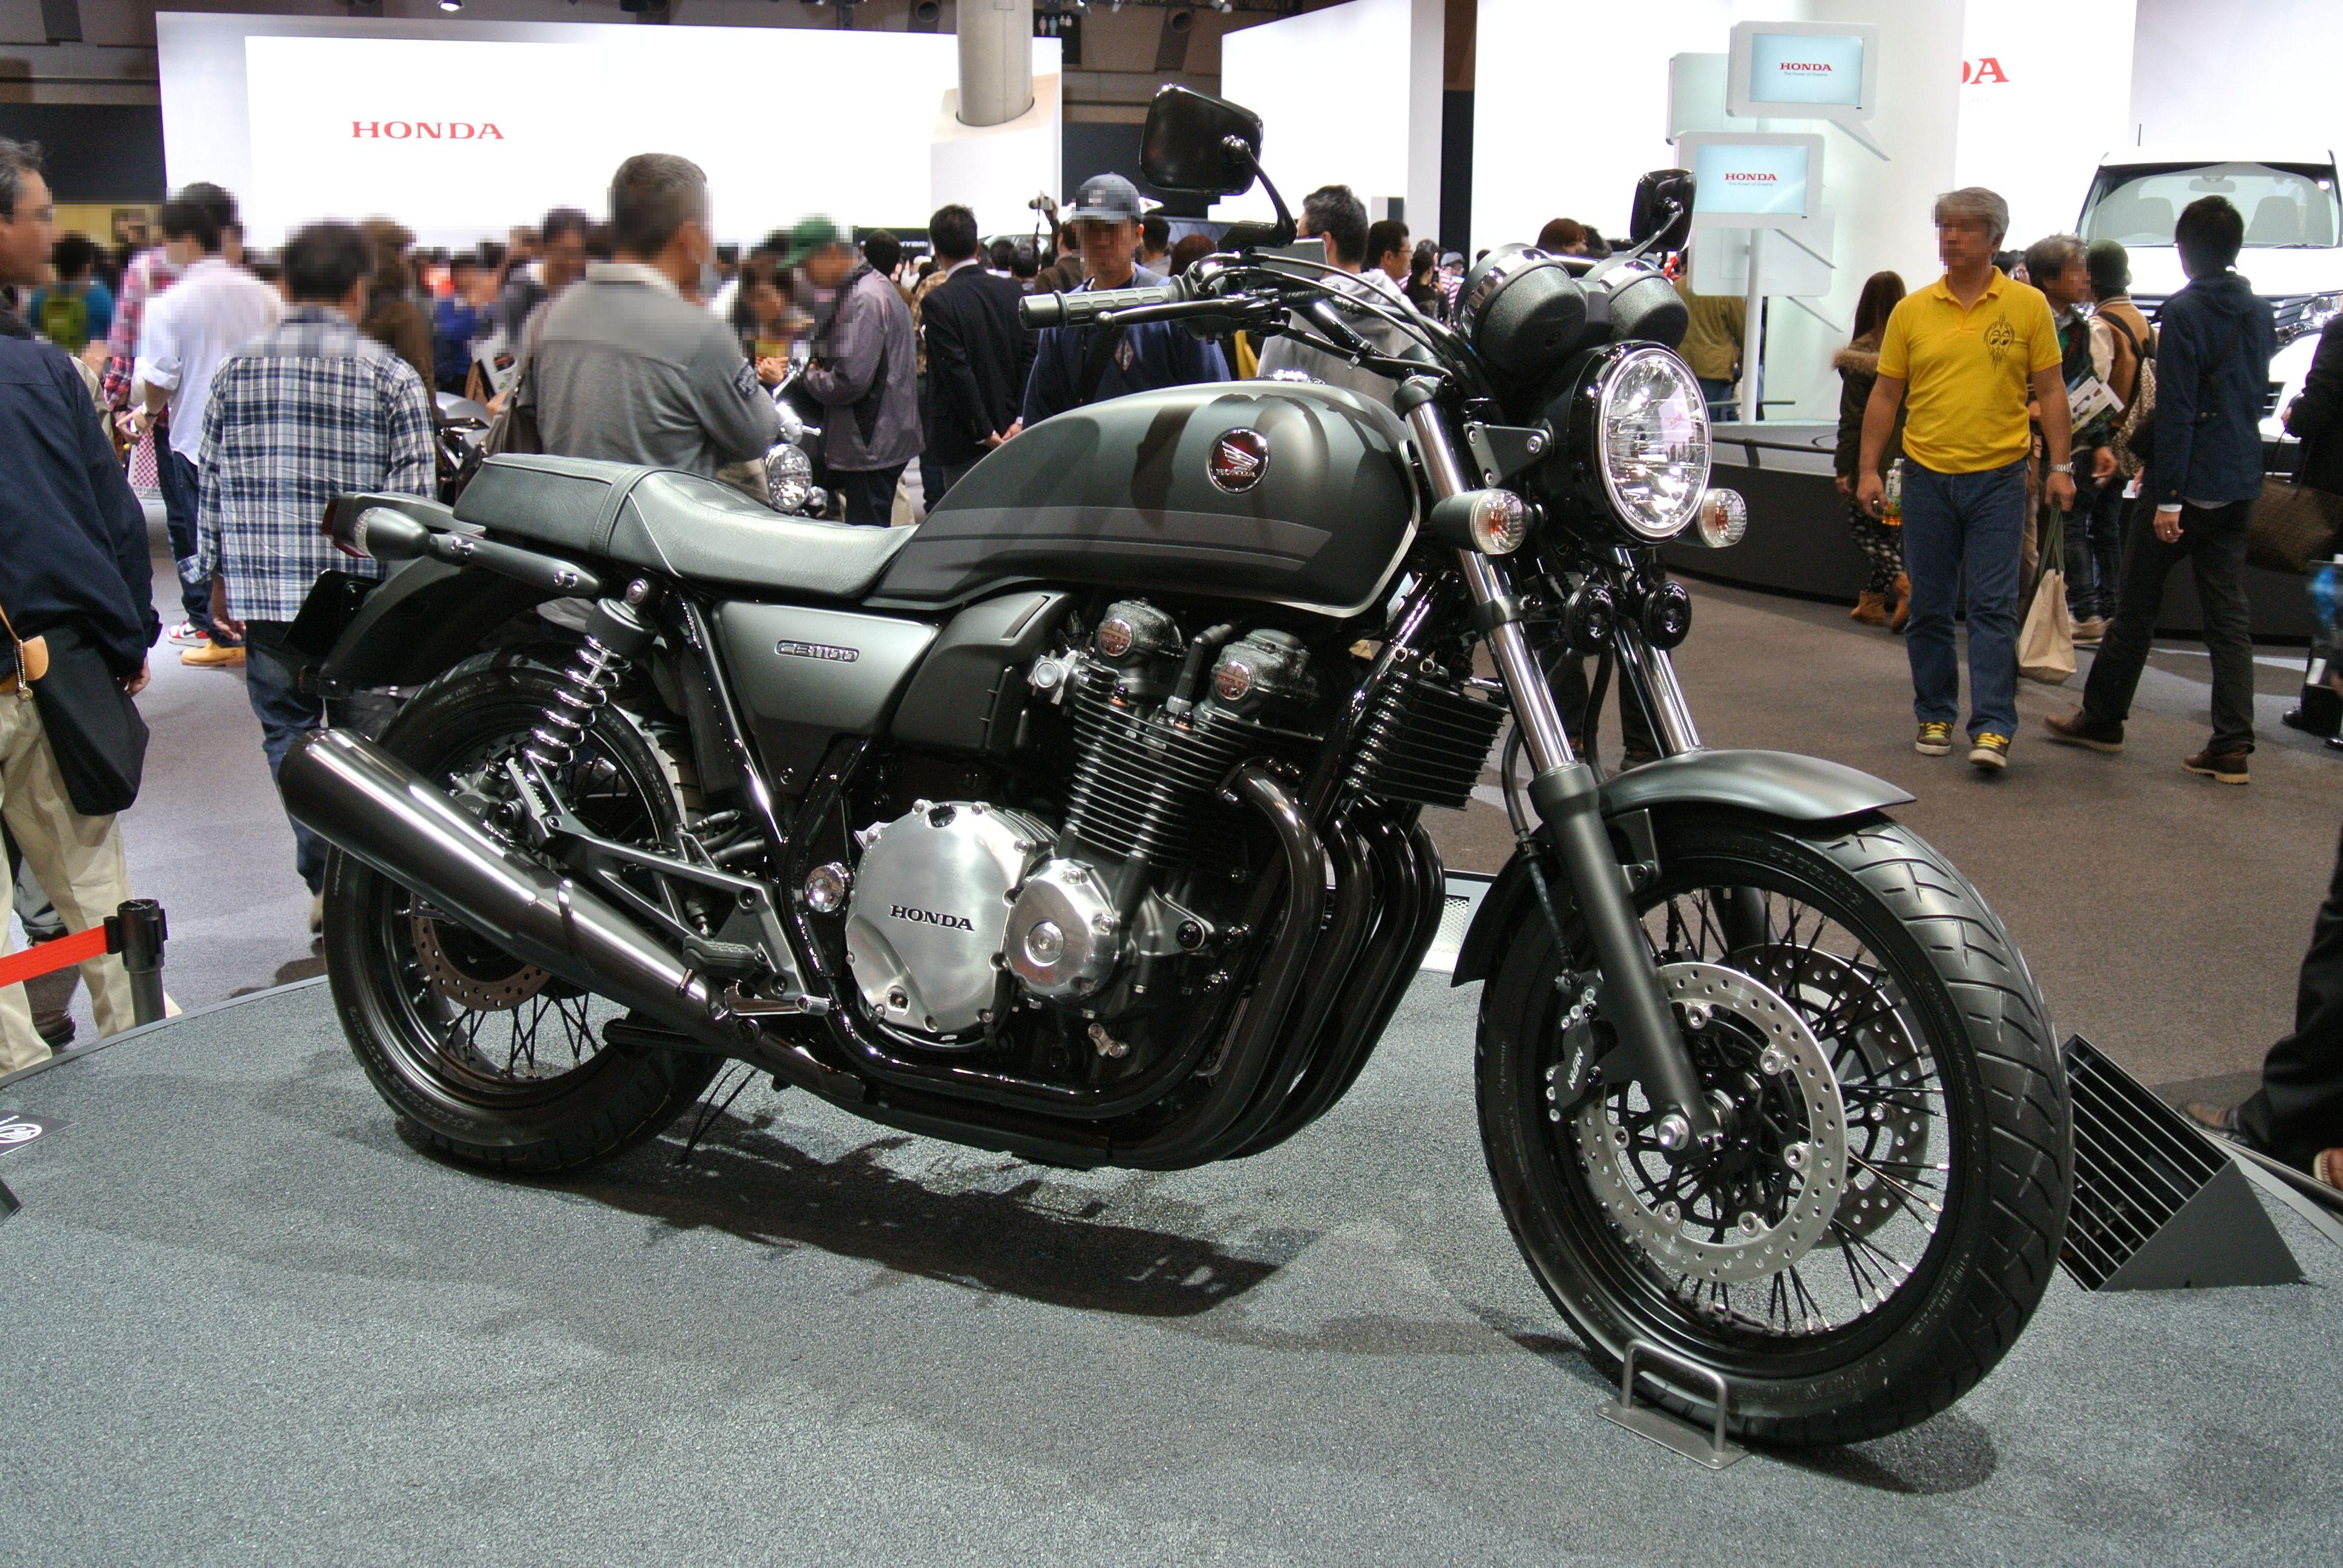 Build A Honda >> File:Honda CB1100 tokyo motorshow.JPG - Wikimedia Commons